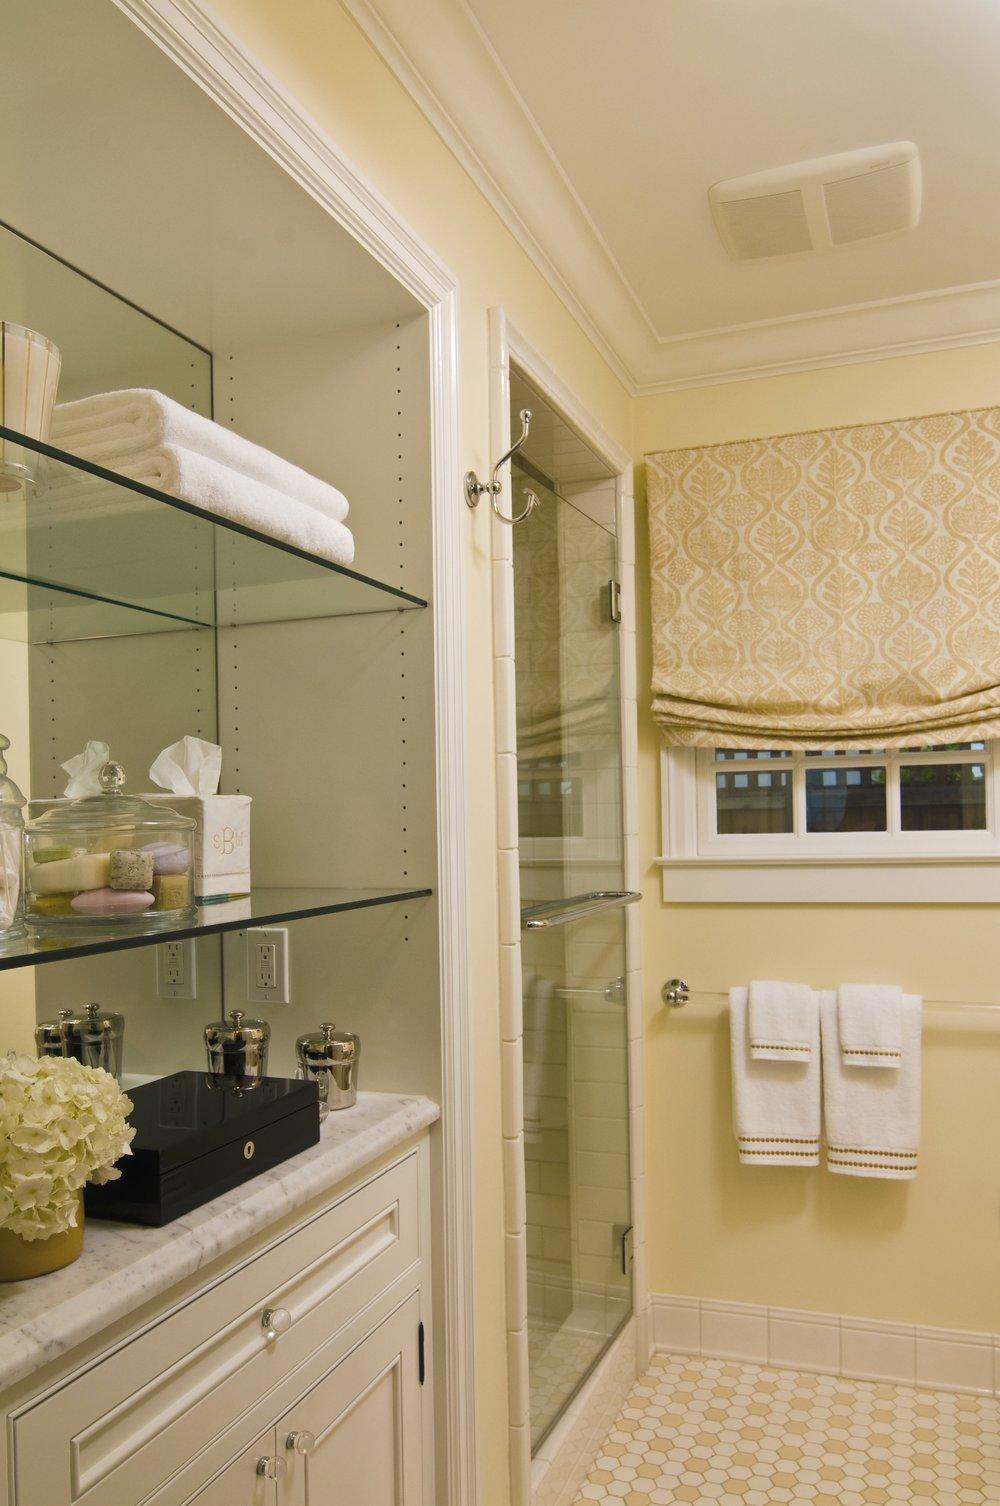 2012-1-6+Bathroom+2.jpg